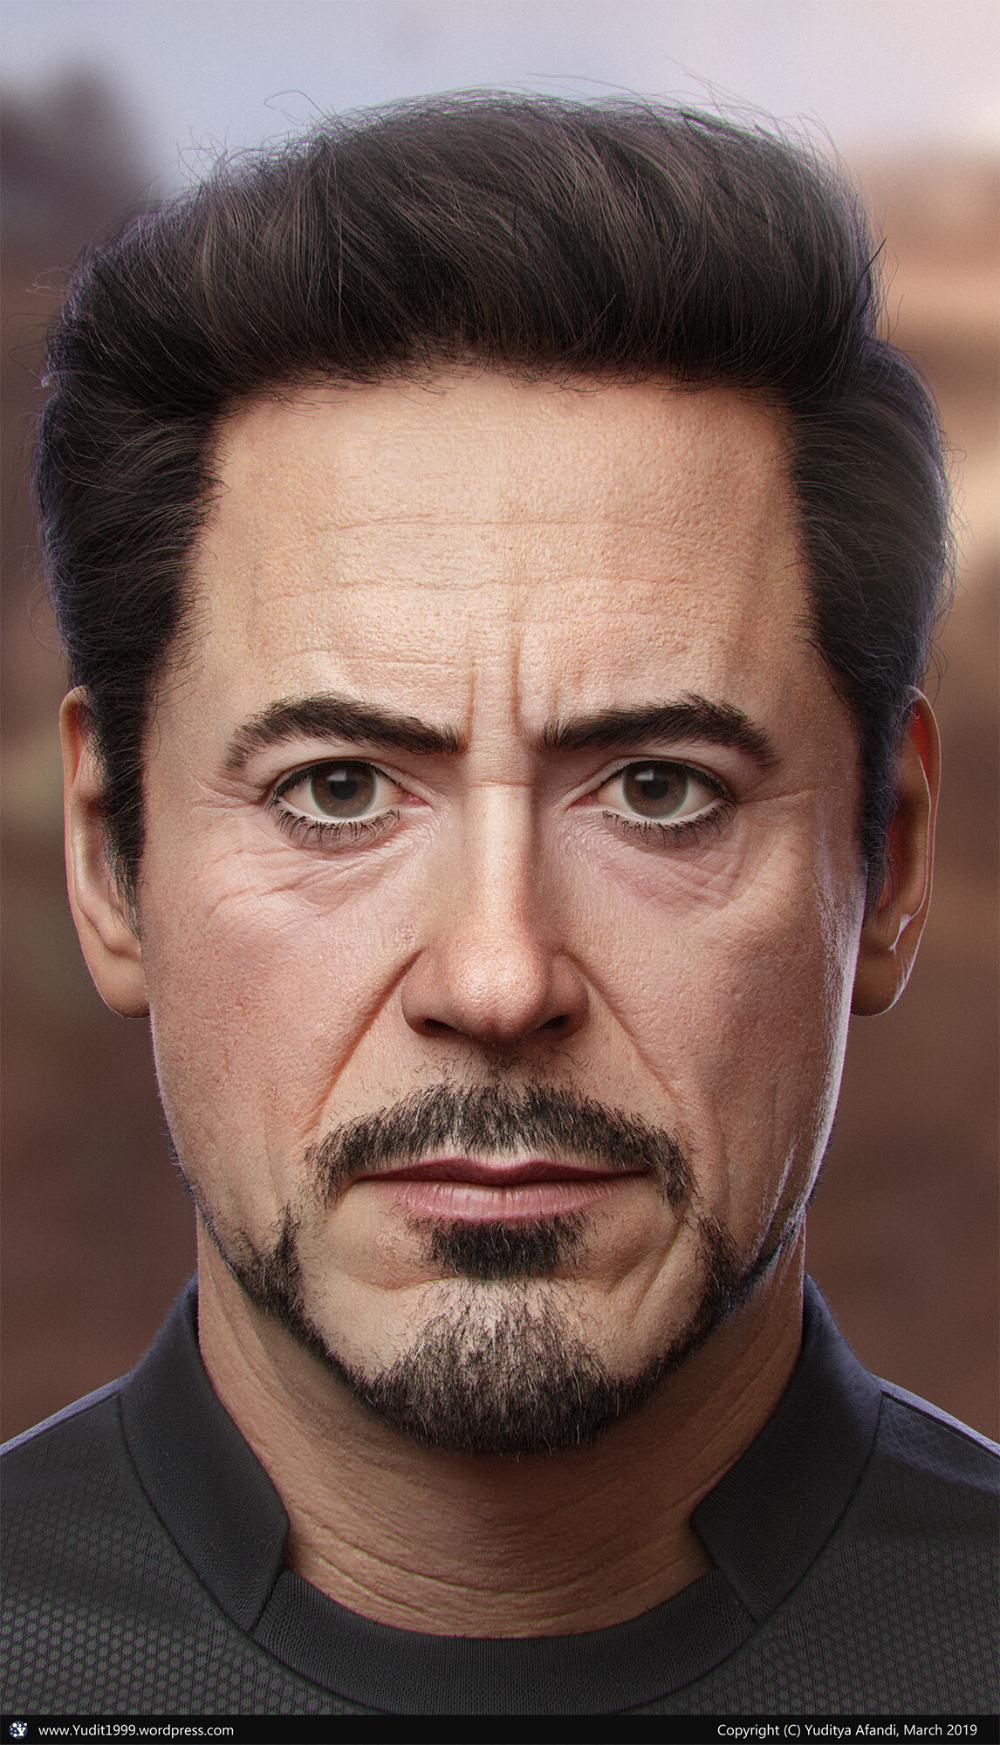 Artstation Tony Stark Yuditya Afandi In 2020 Tony Stark Art Tony Stark Robert Downey Jr Iron Man